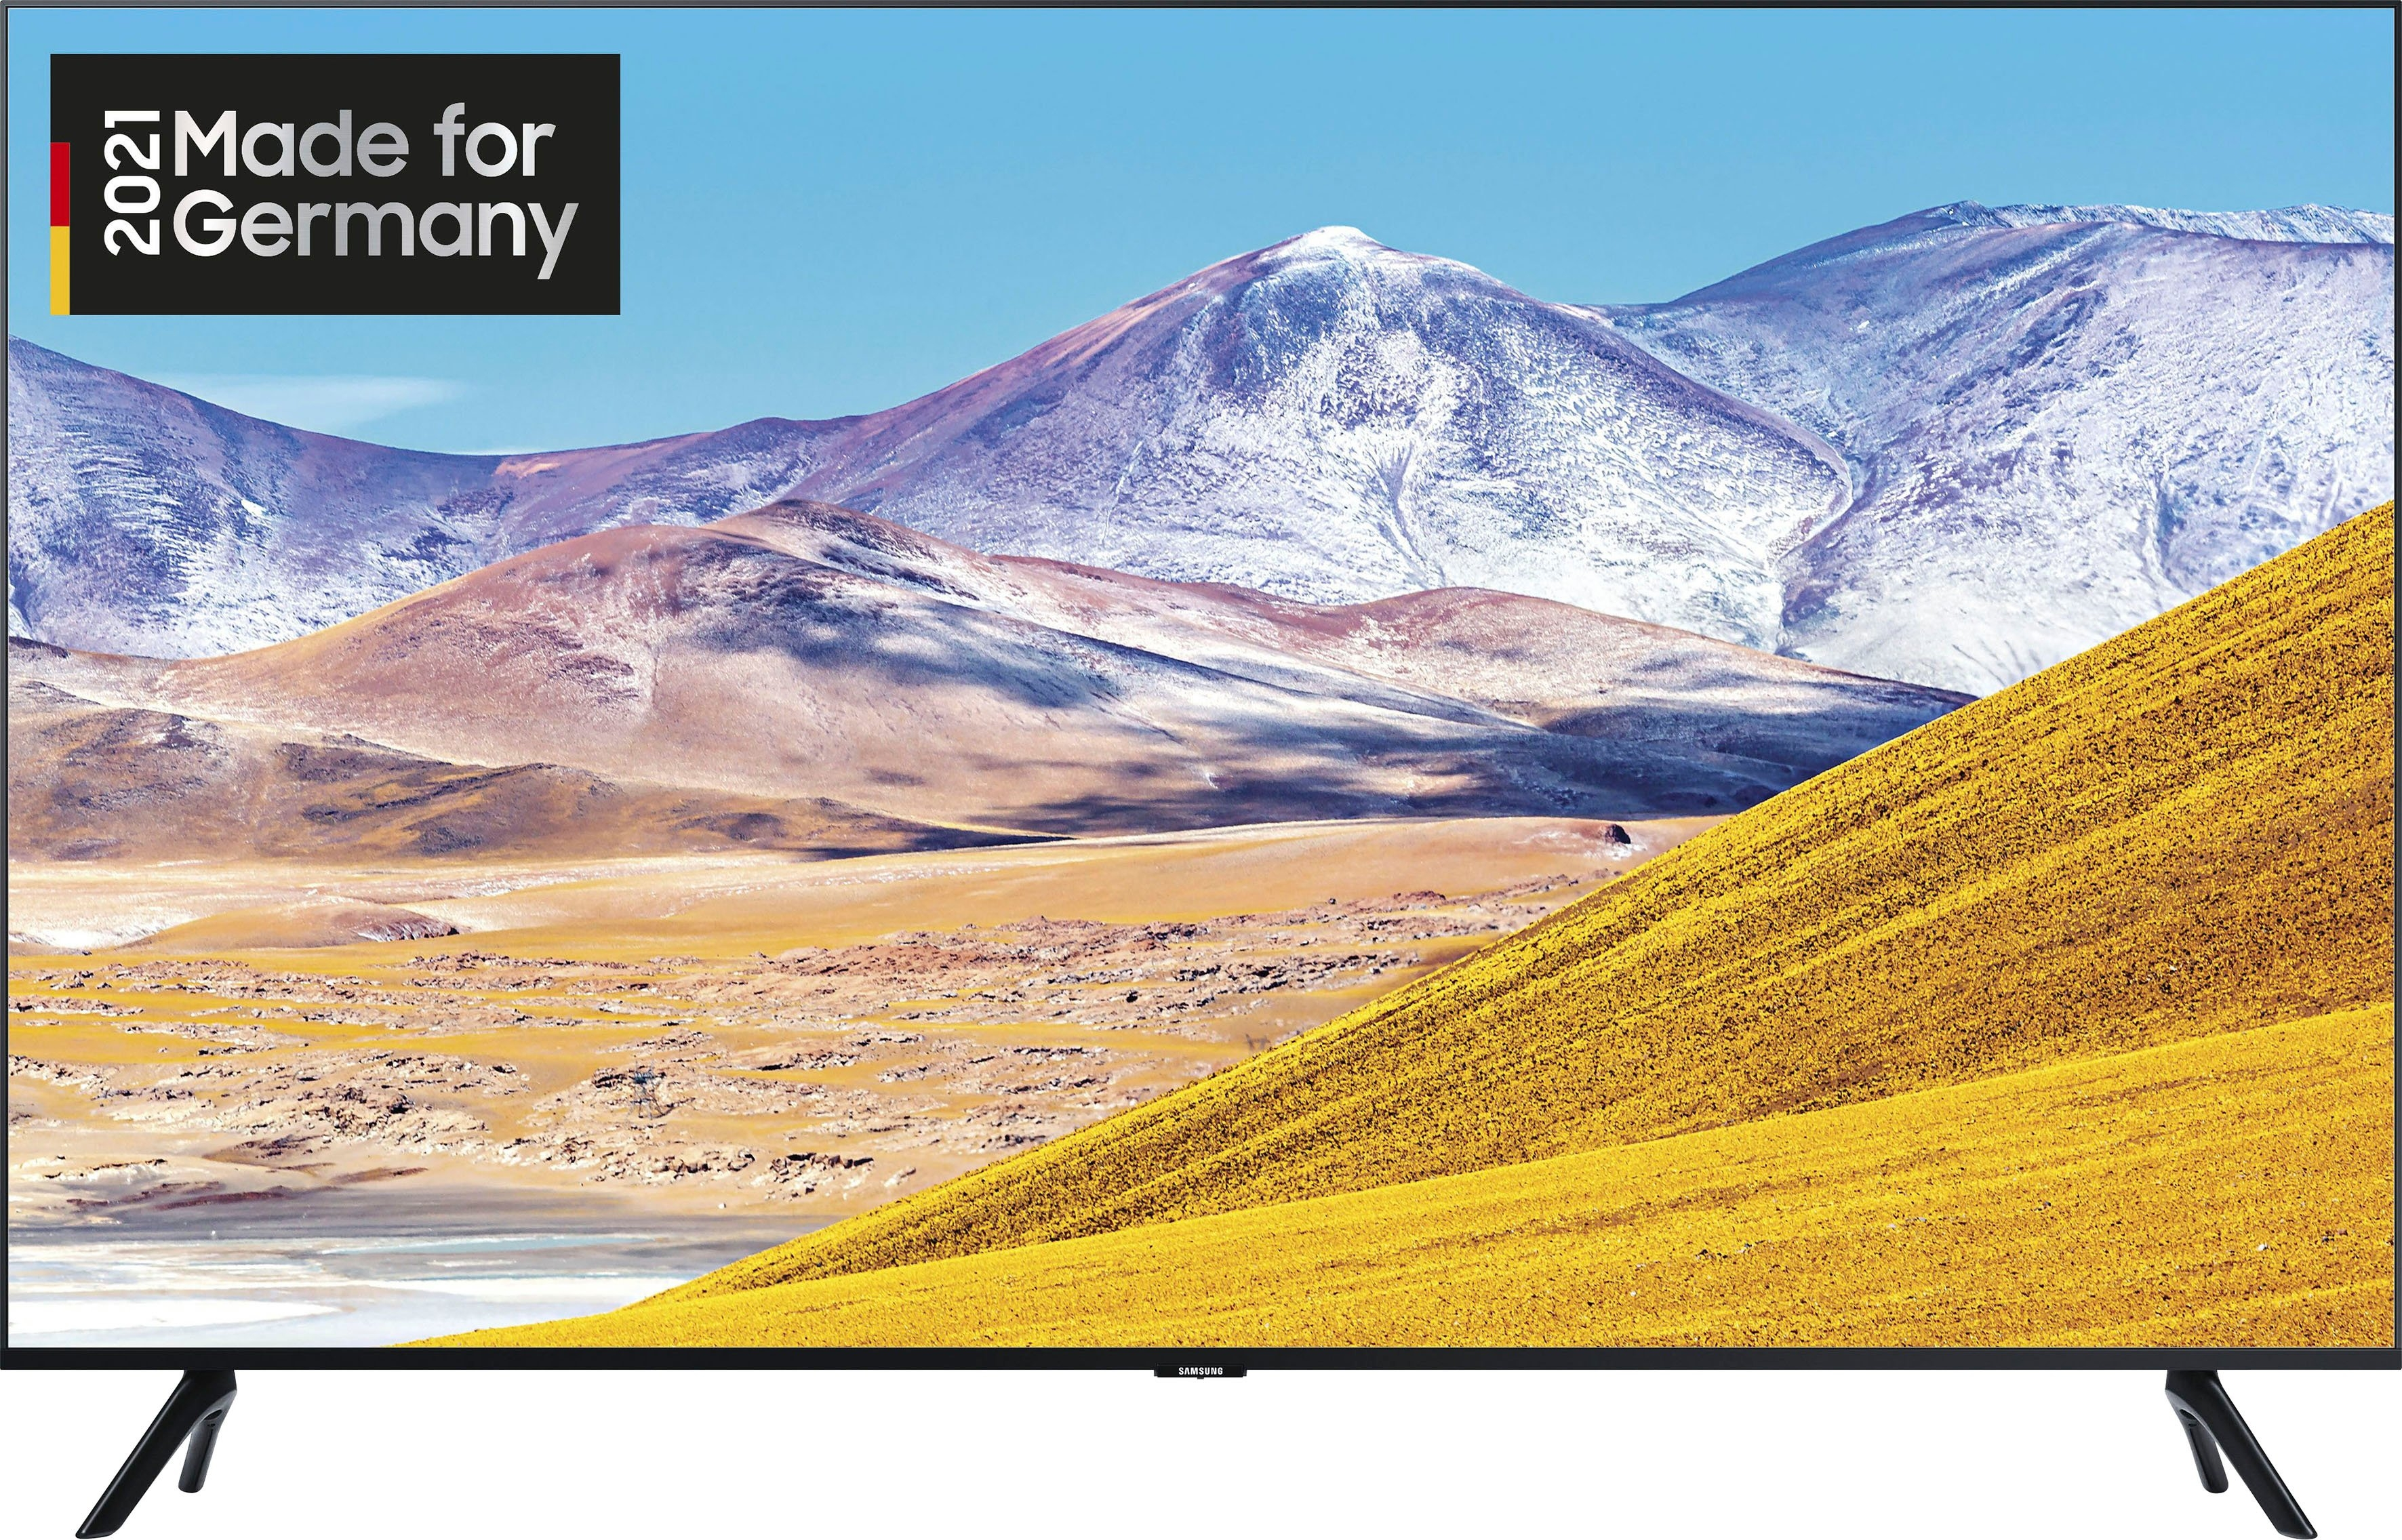 Samsung »GU82TU8079« LED-TV in de webshop van OTTO kopen